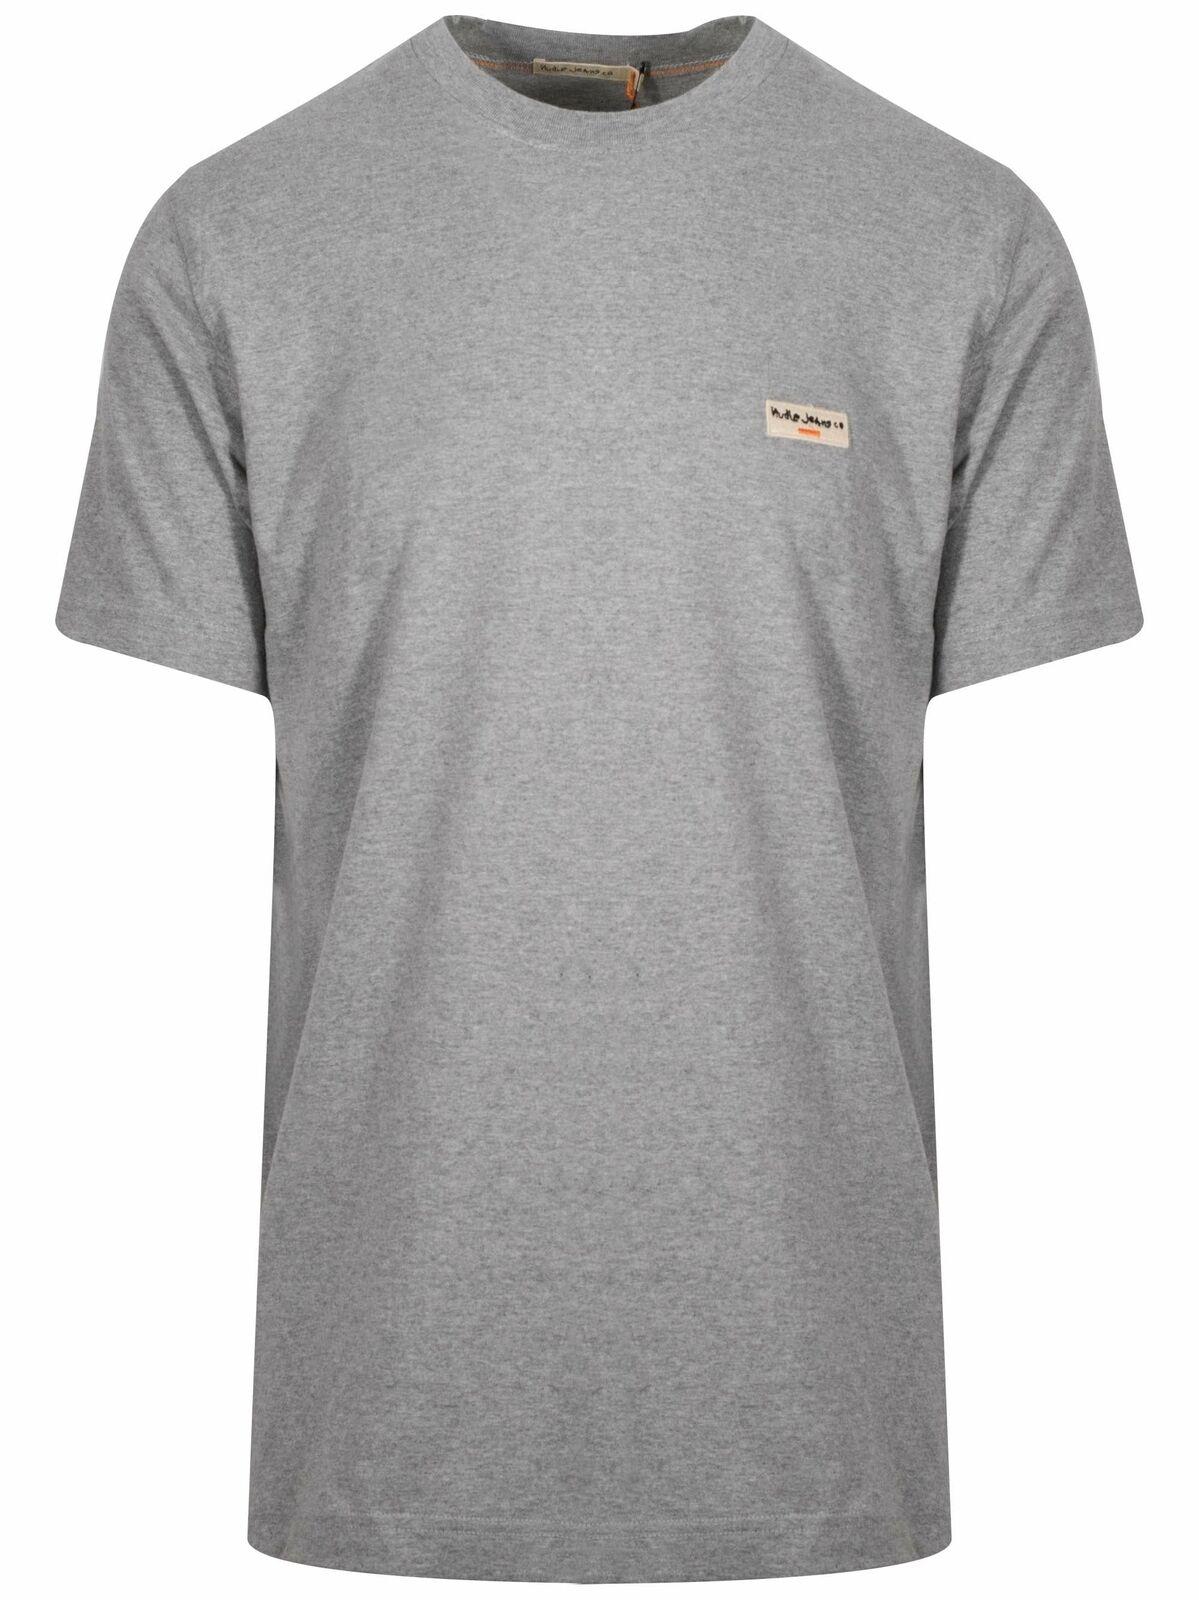 f405212c Nudie Grey Melange Logo T-Shirt Jeans Daniel pdtfdm30374-T-Shirts ...